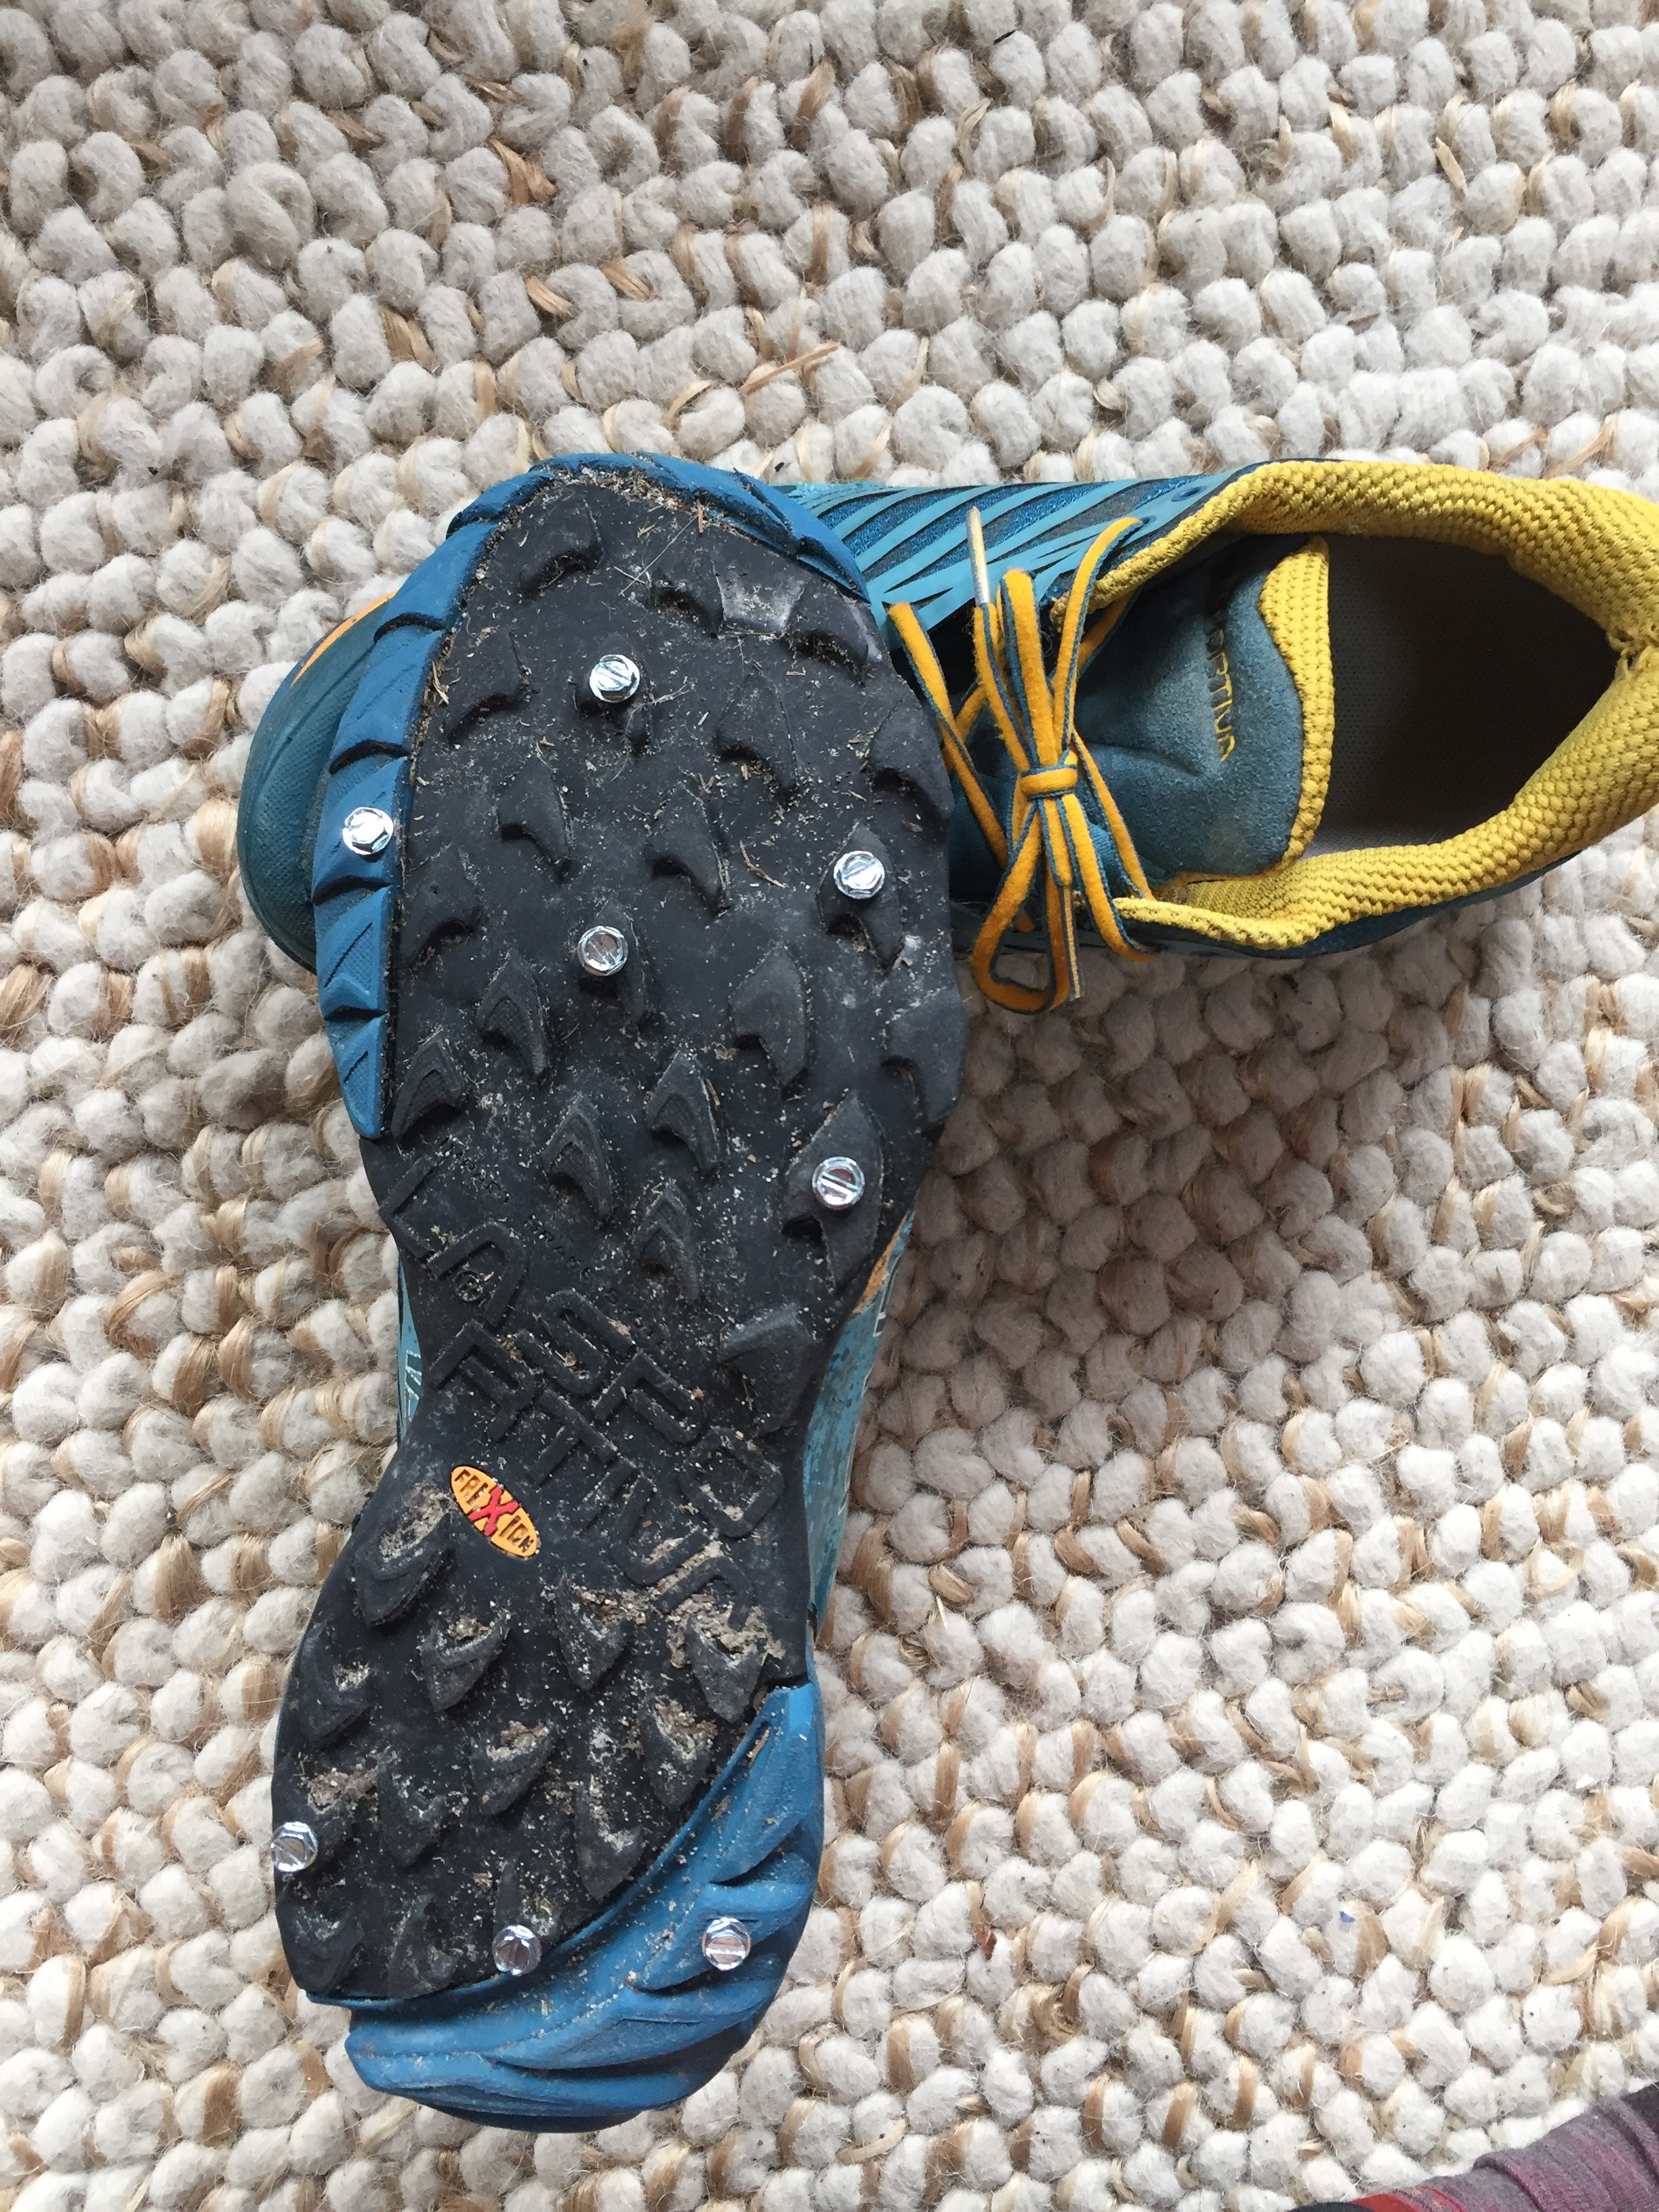 screw shoes 2.jpg